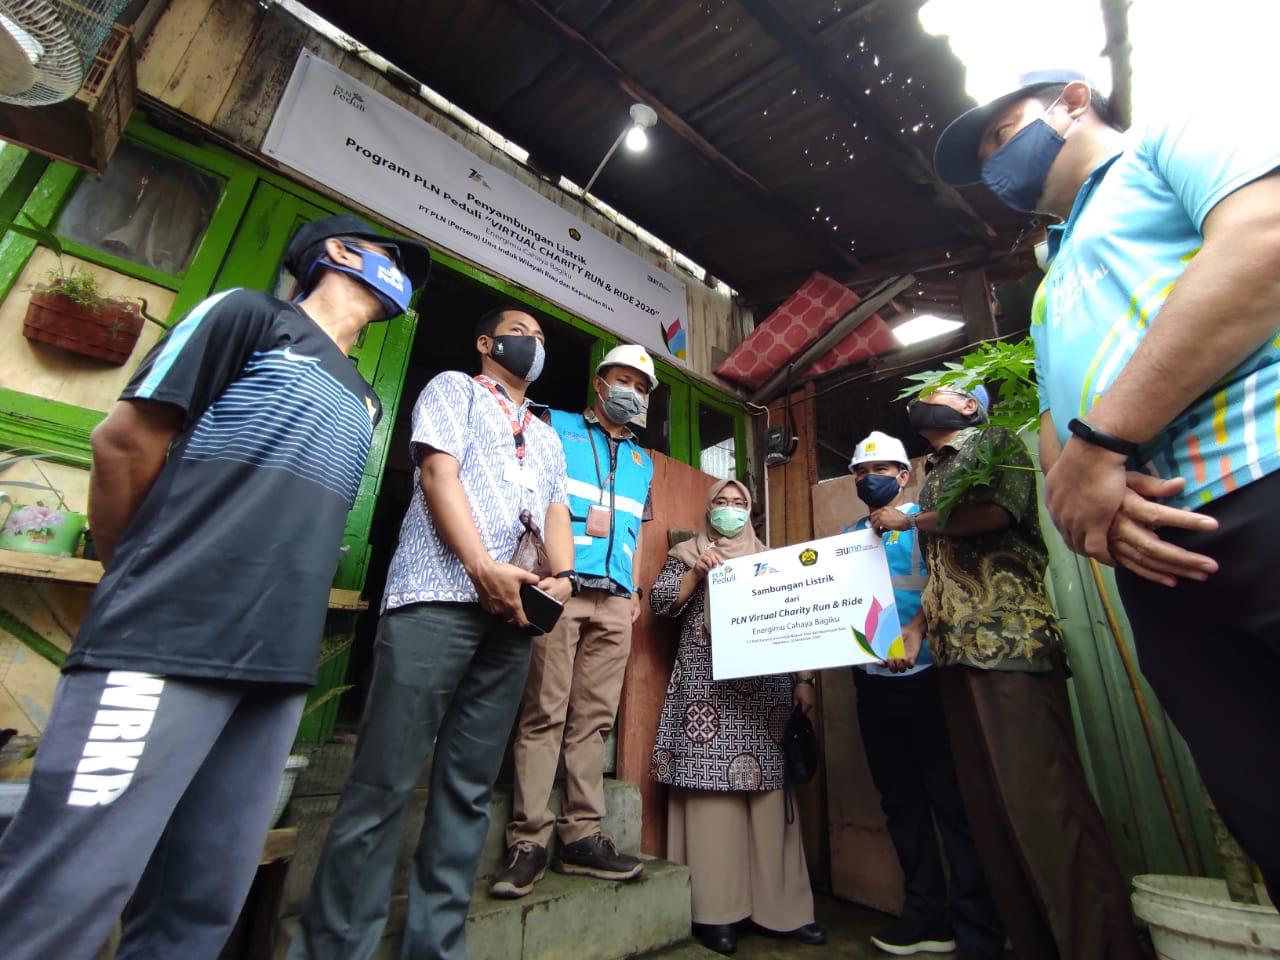 Virtual Charity Run and Ride PLN, 2.000 Rumah Dapat Listrik Gratis di Sumatera dan Kalimantan Barat